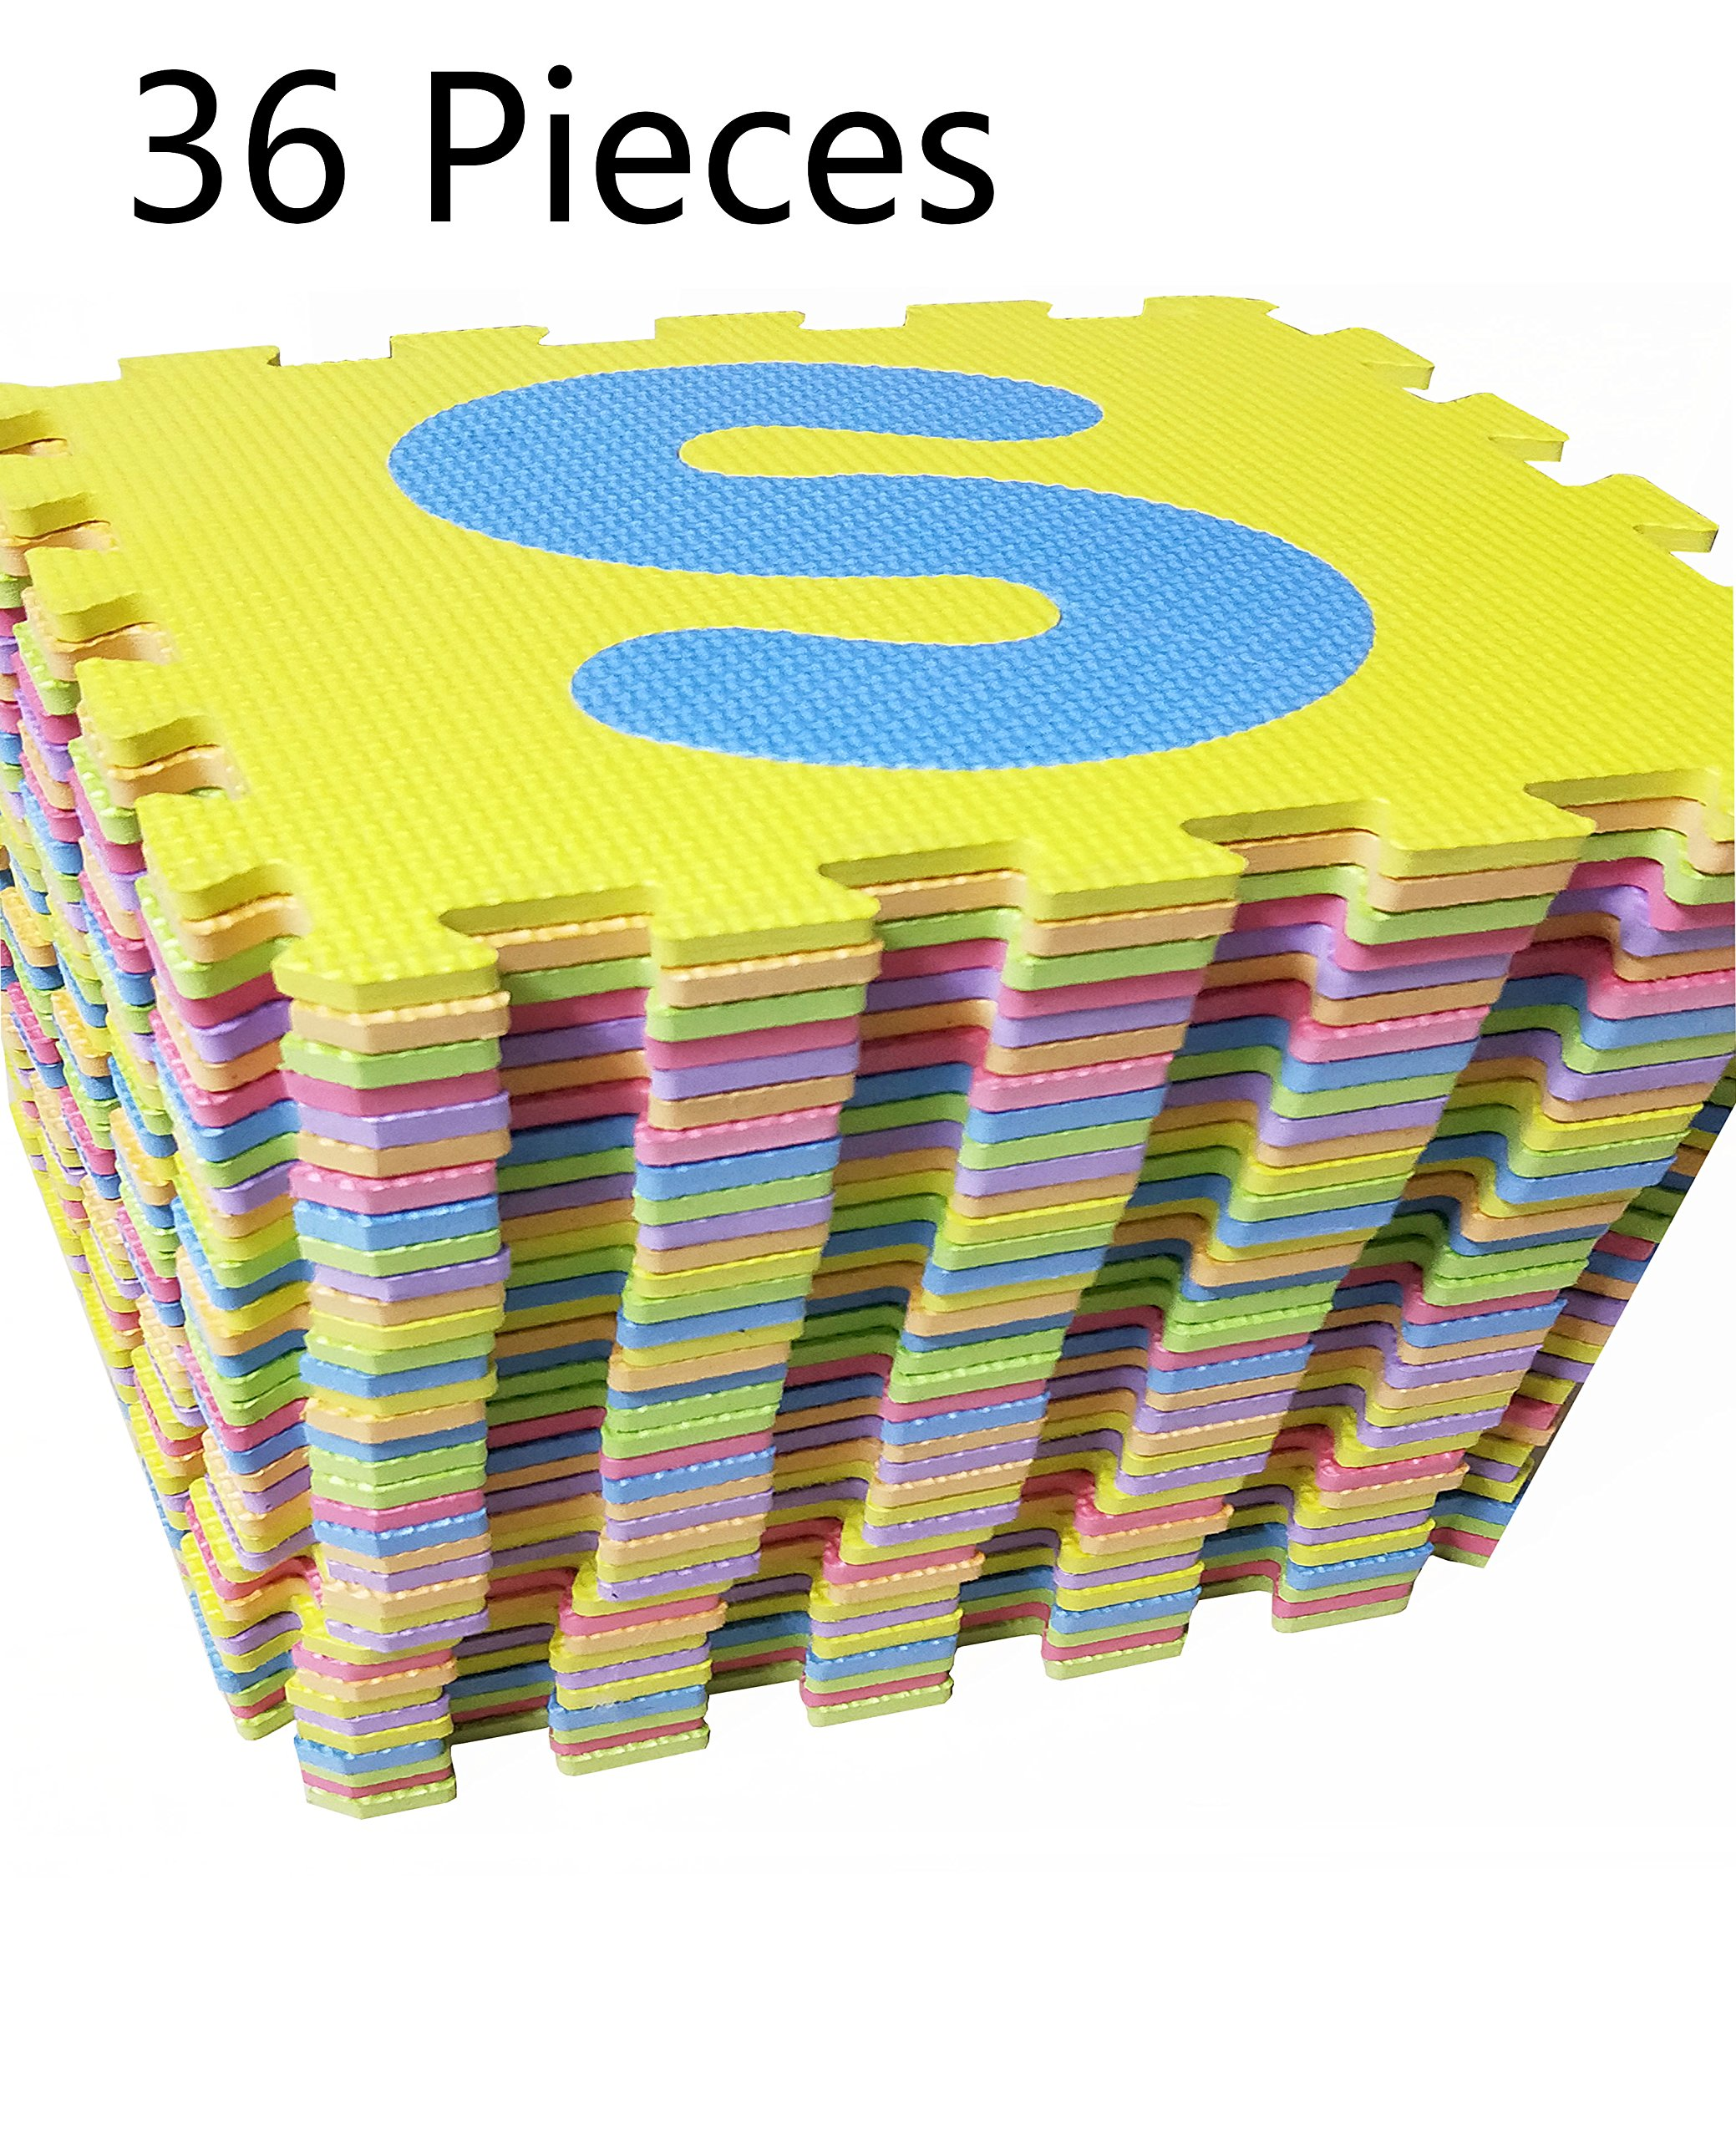 Puzzle Play Mat,Foam Floor Play Mat,Foam Interlocking Tiles,Alphabet & Number Foam Puzzle Mat,NON-TOXIC EVA 36 Piece Multi-Color Children Play & Exercise Mat (Large) (Large) by Chuanyue (Image #5)